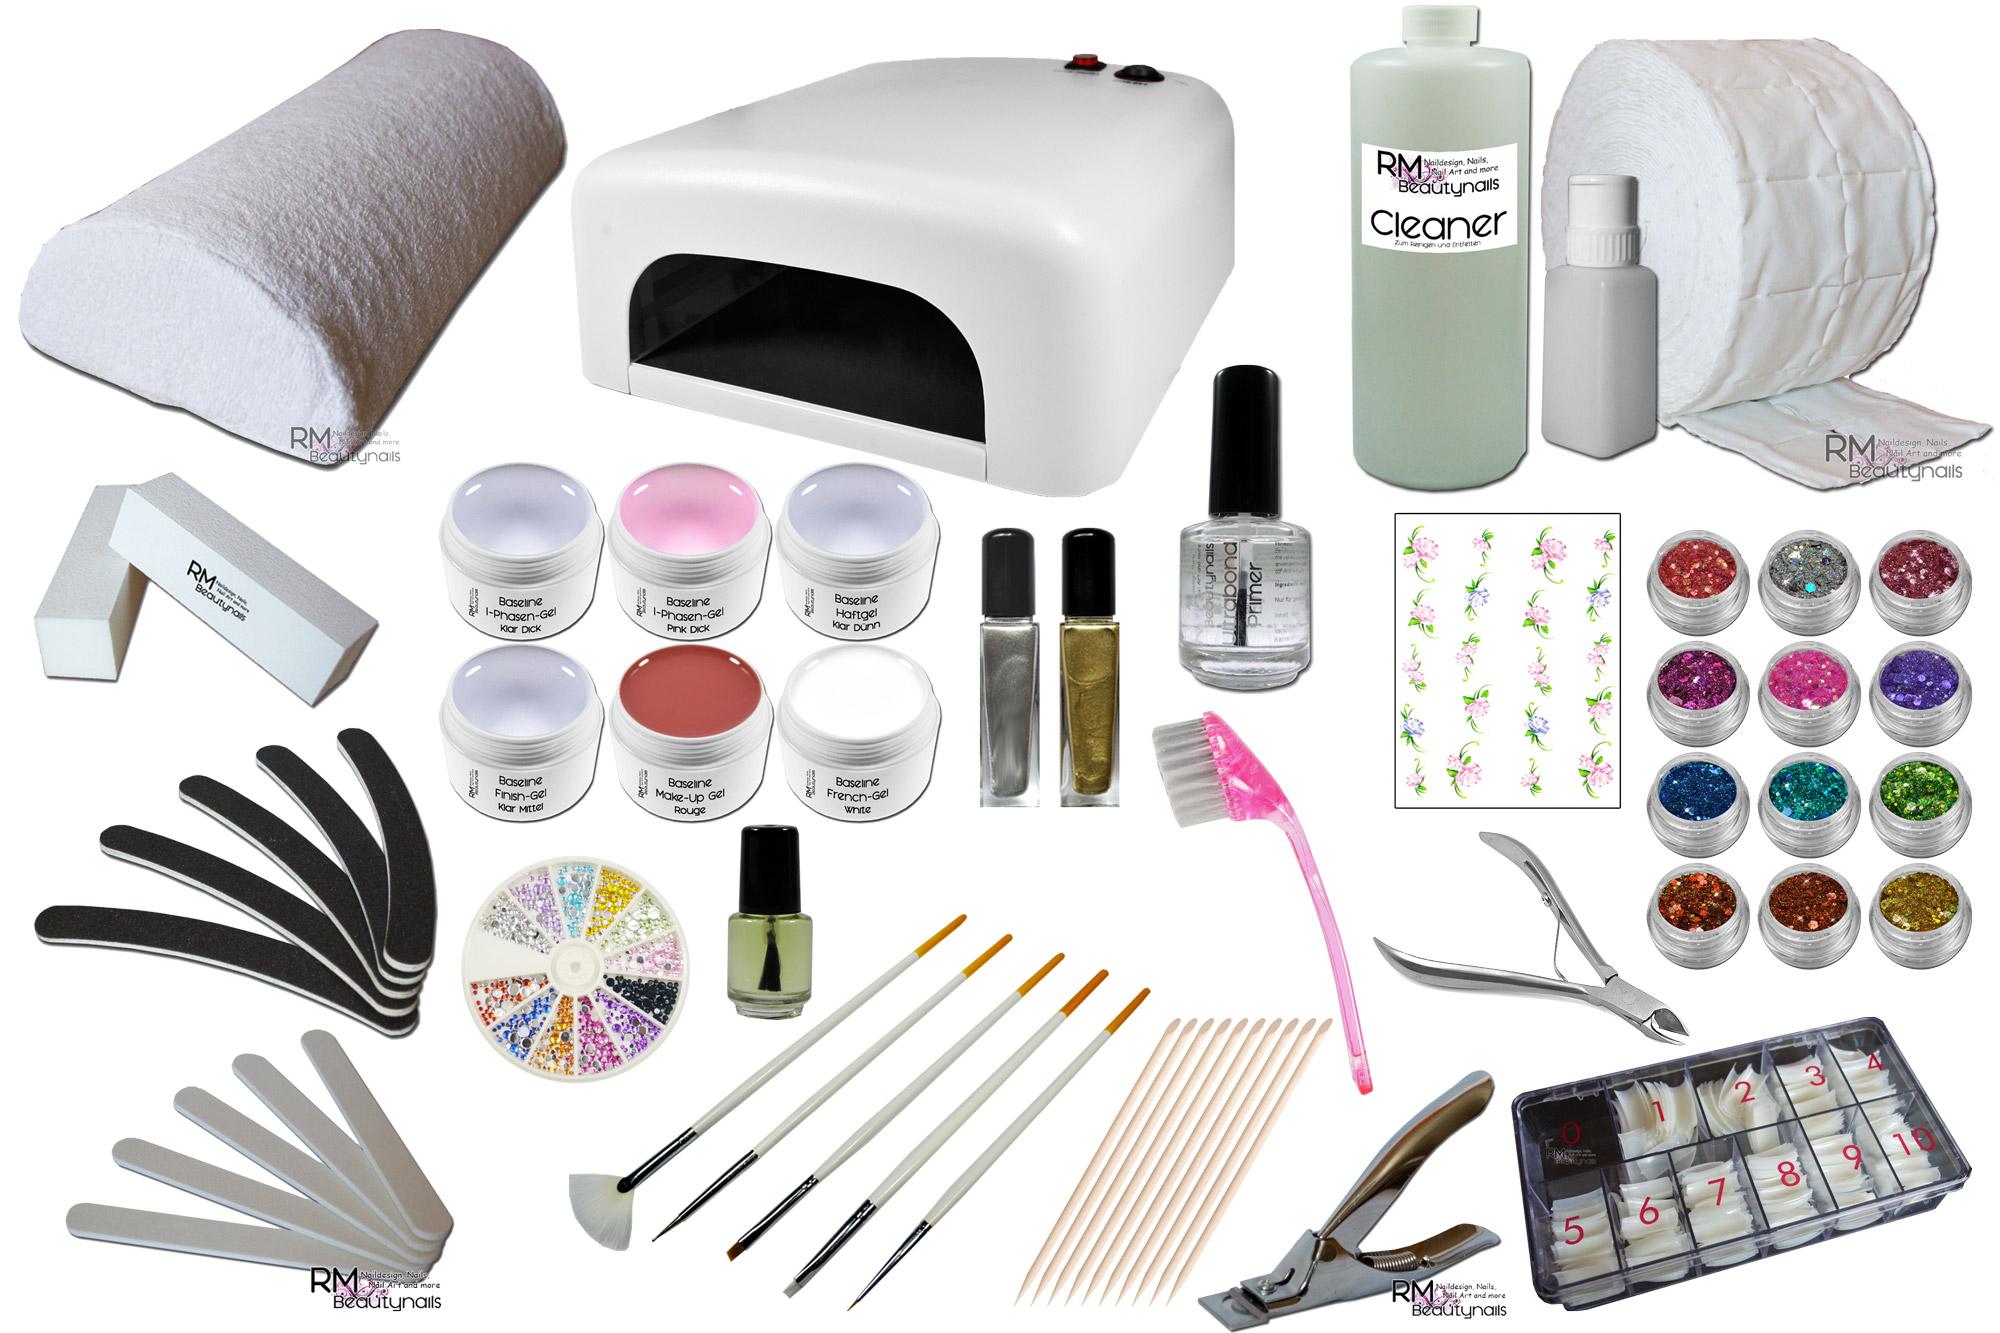 rm beautynails uv gel starterset uv lampe 36watt xxl fimo und glitter. Black Bedroom Furniture Sets. Home Design Ideas